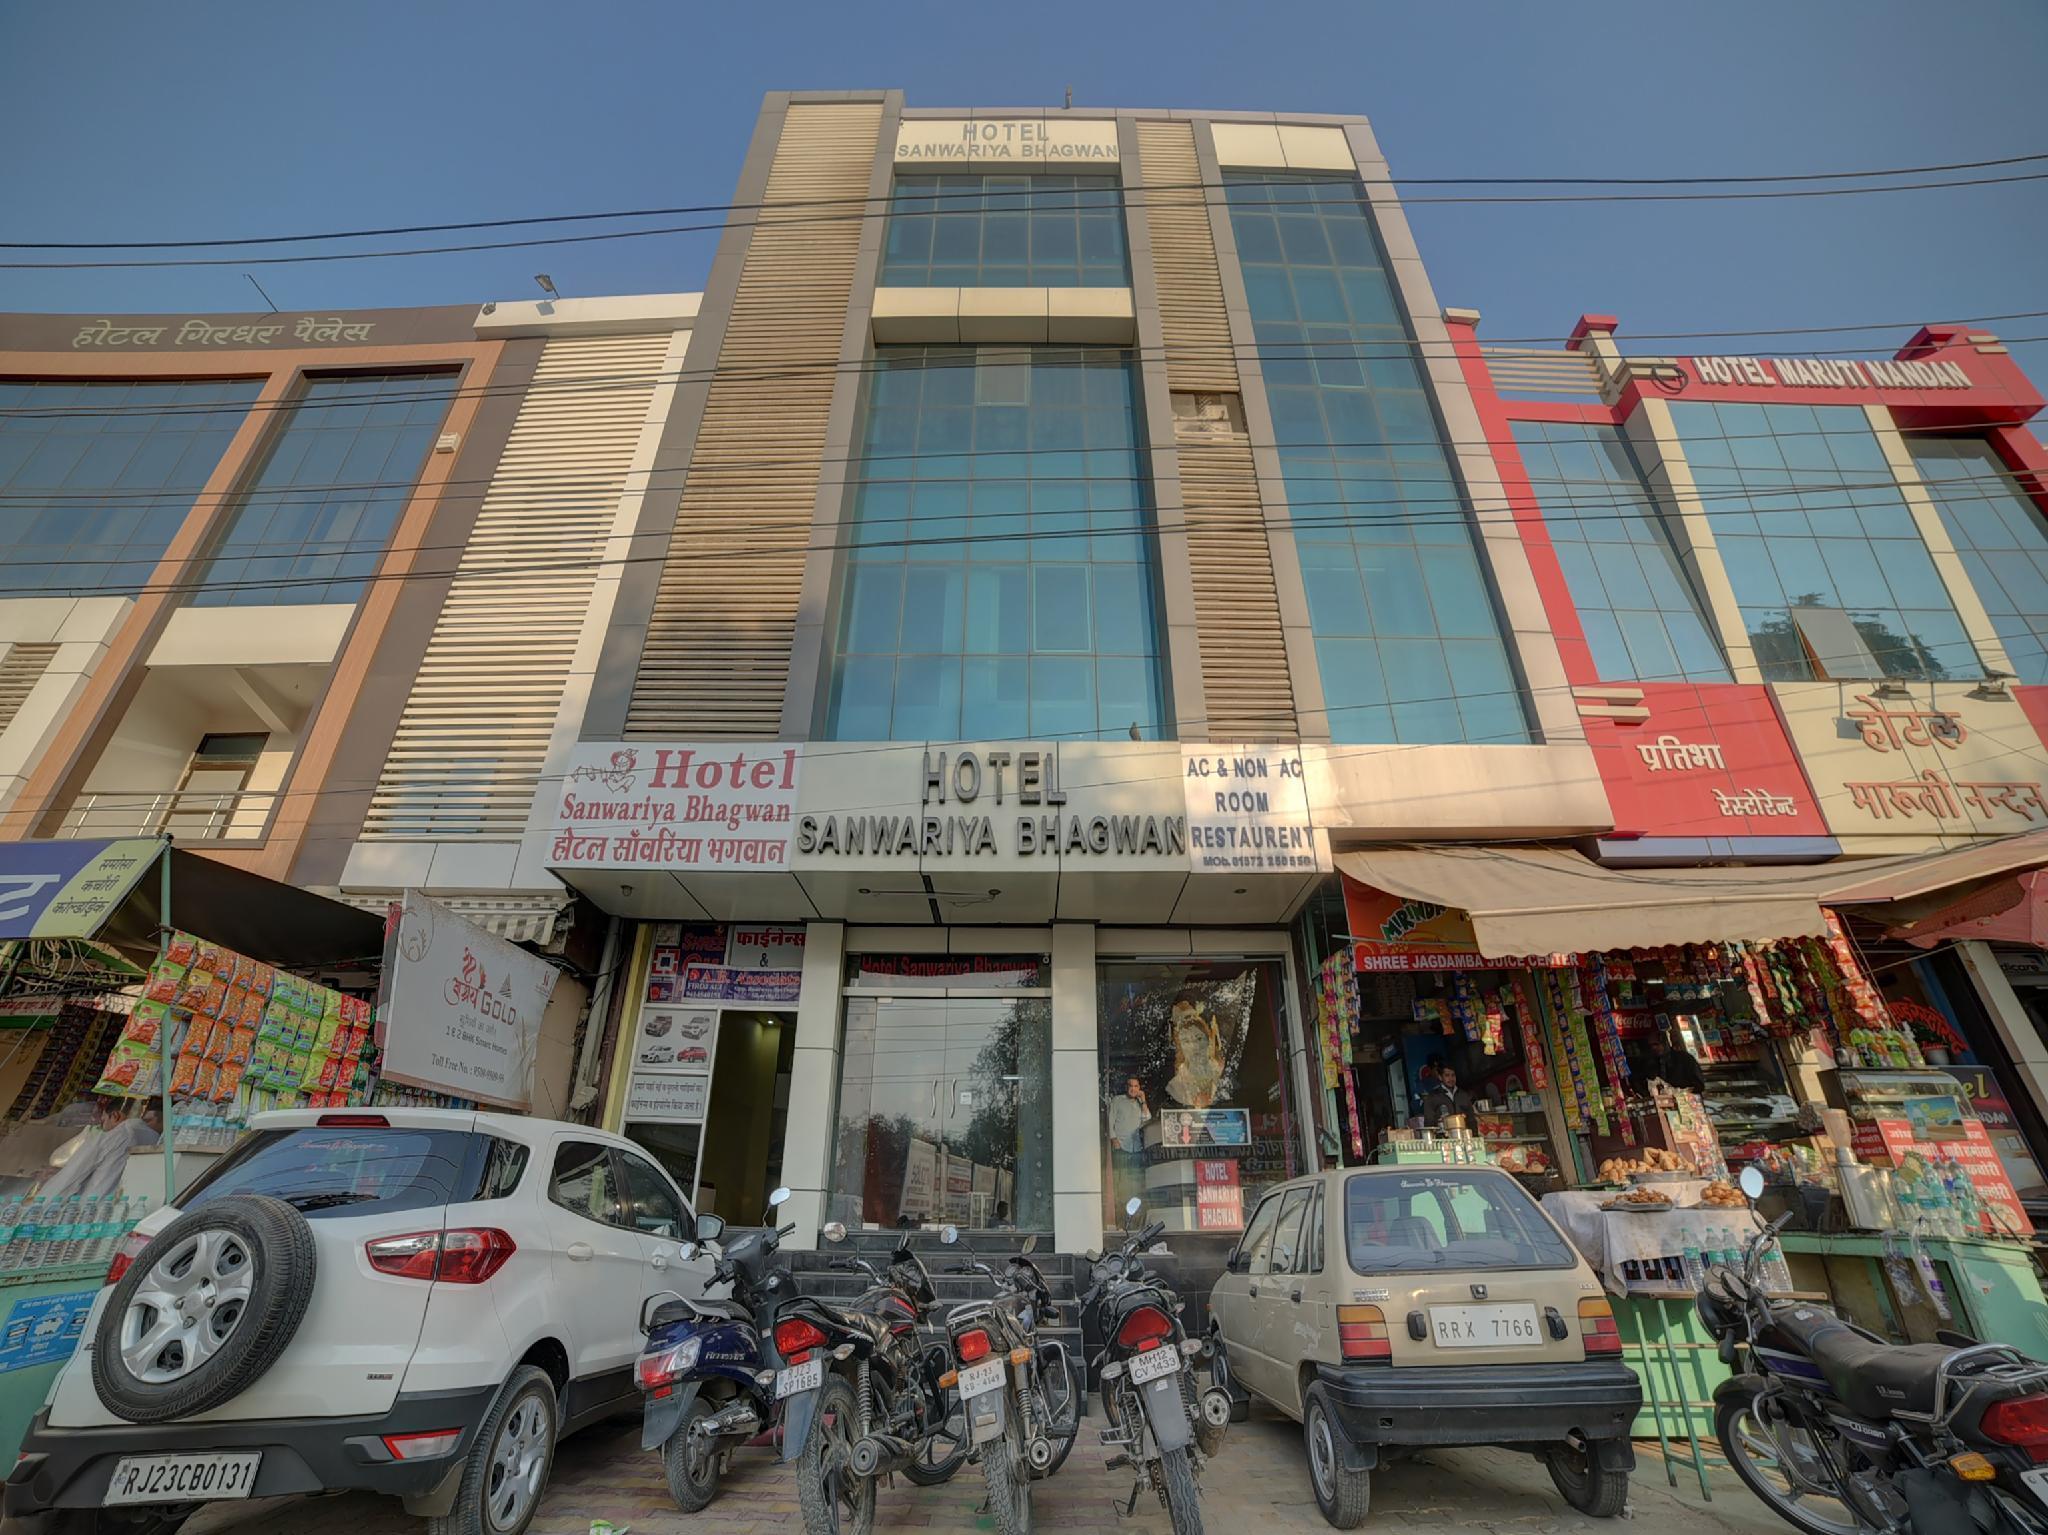 OYO 30243 Hotel Sanwariya Bhagwan, Sikar